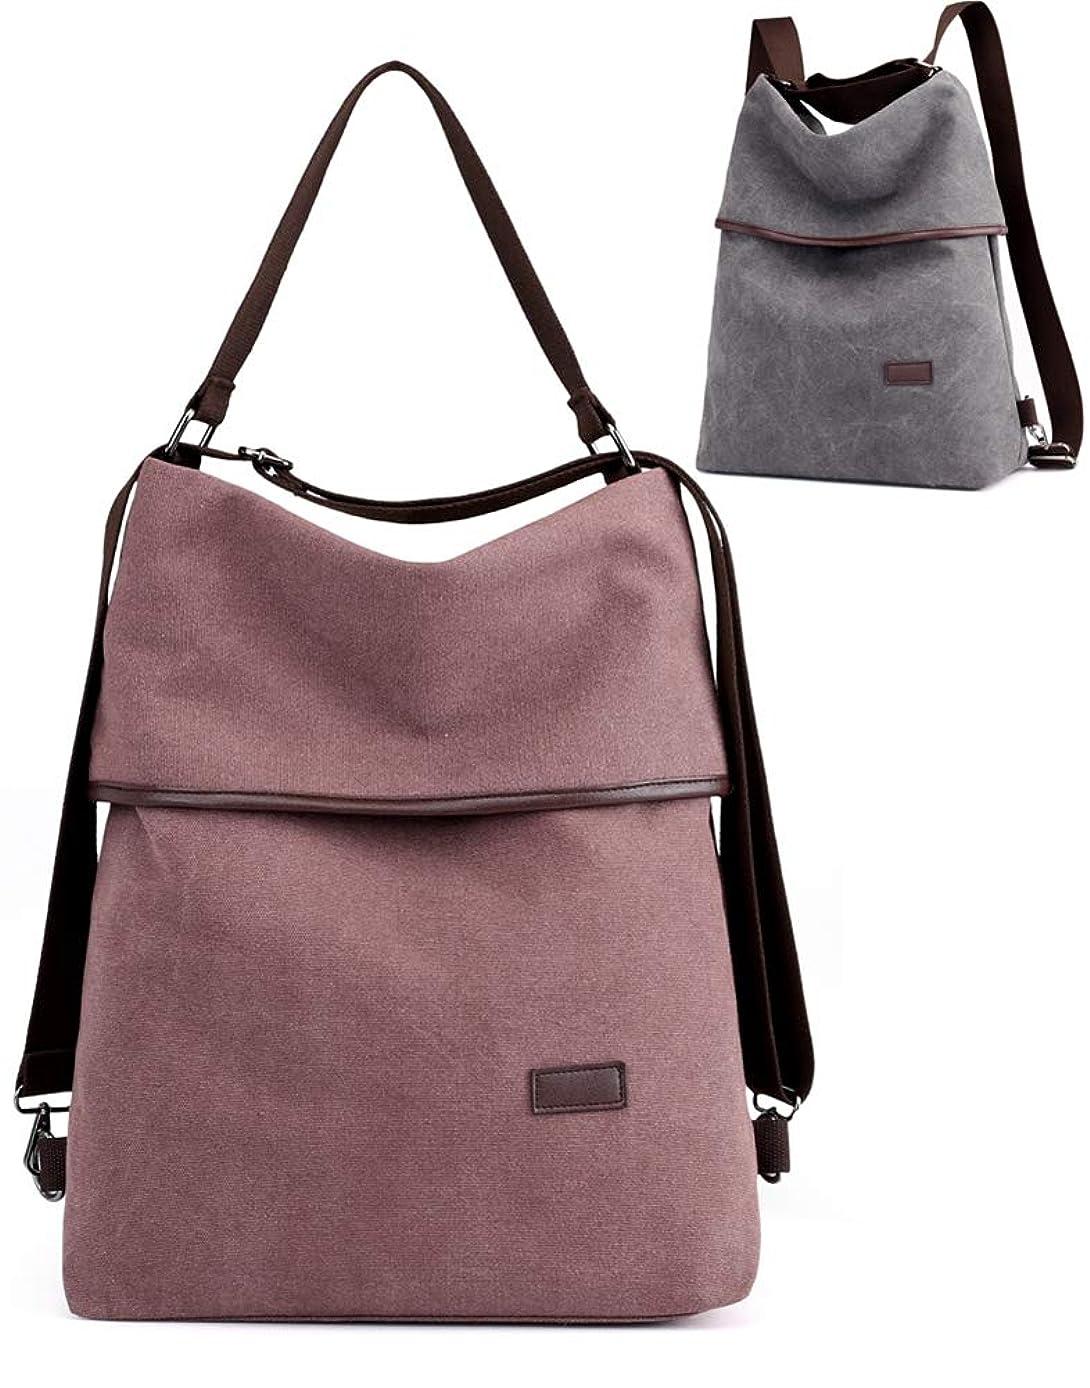 Vintage Convertible Backpack Women Travel 15.6inch Laptop Canvas Backpack Purse Casual School Shoulder Bag Light Purple